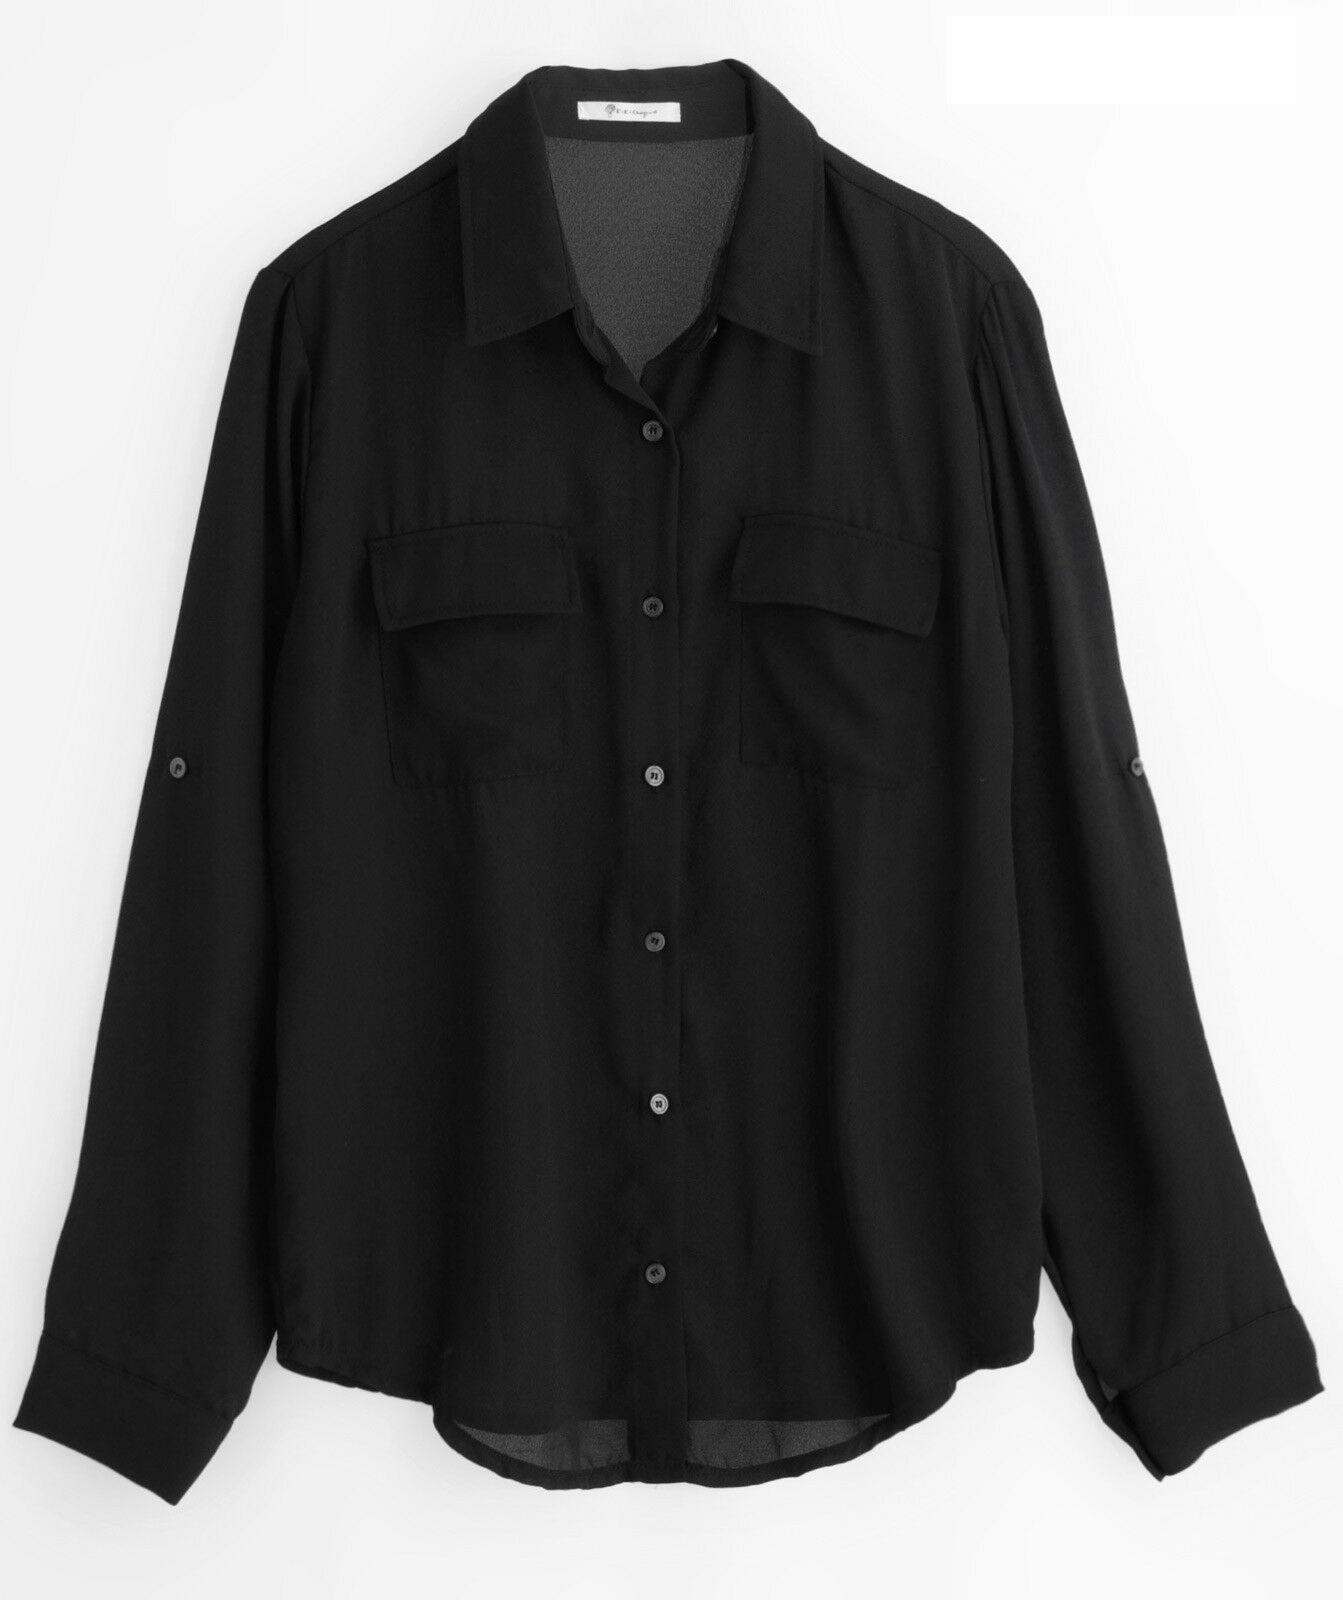 4da5625ec7222 Annakastle Womens Semi-Sheer Chiffon Button-Down Pocket Utility Shirt  Blouse S-M